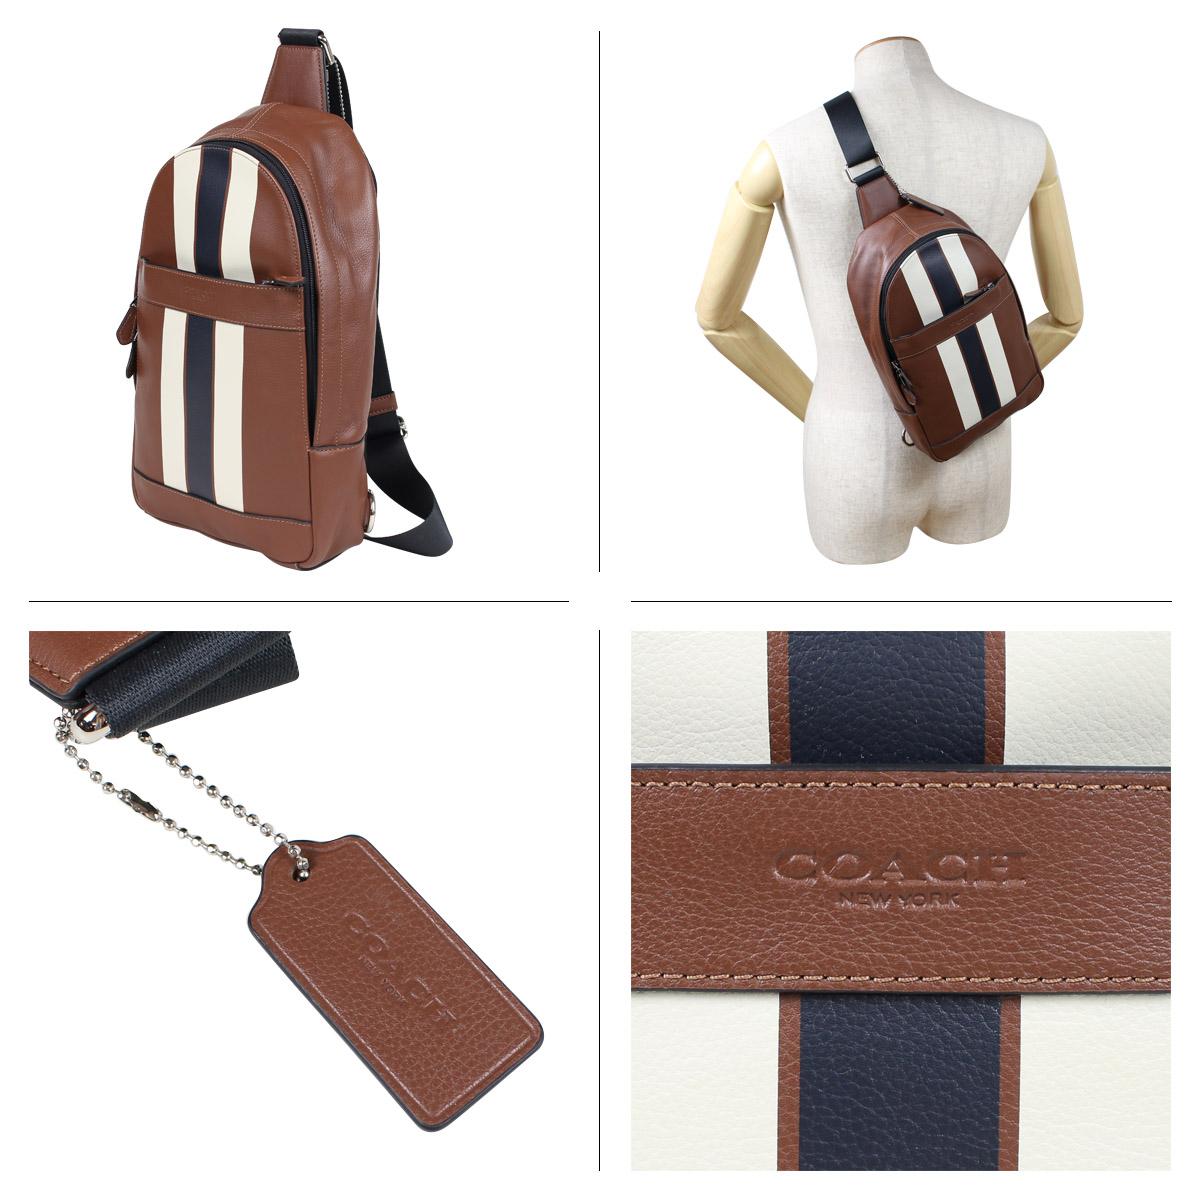 Coach F72226 Bag Shoulder Body Men Leather Brown 5 11 Shinnyu Load 185